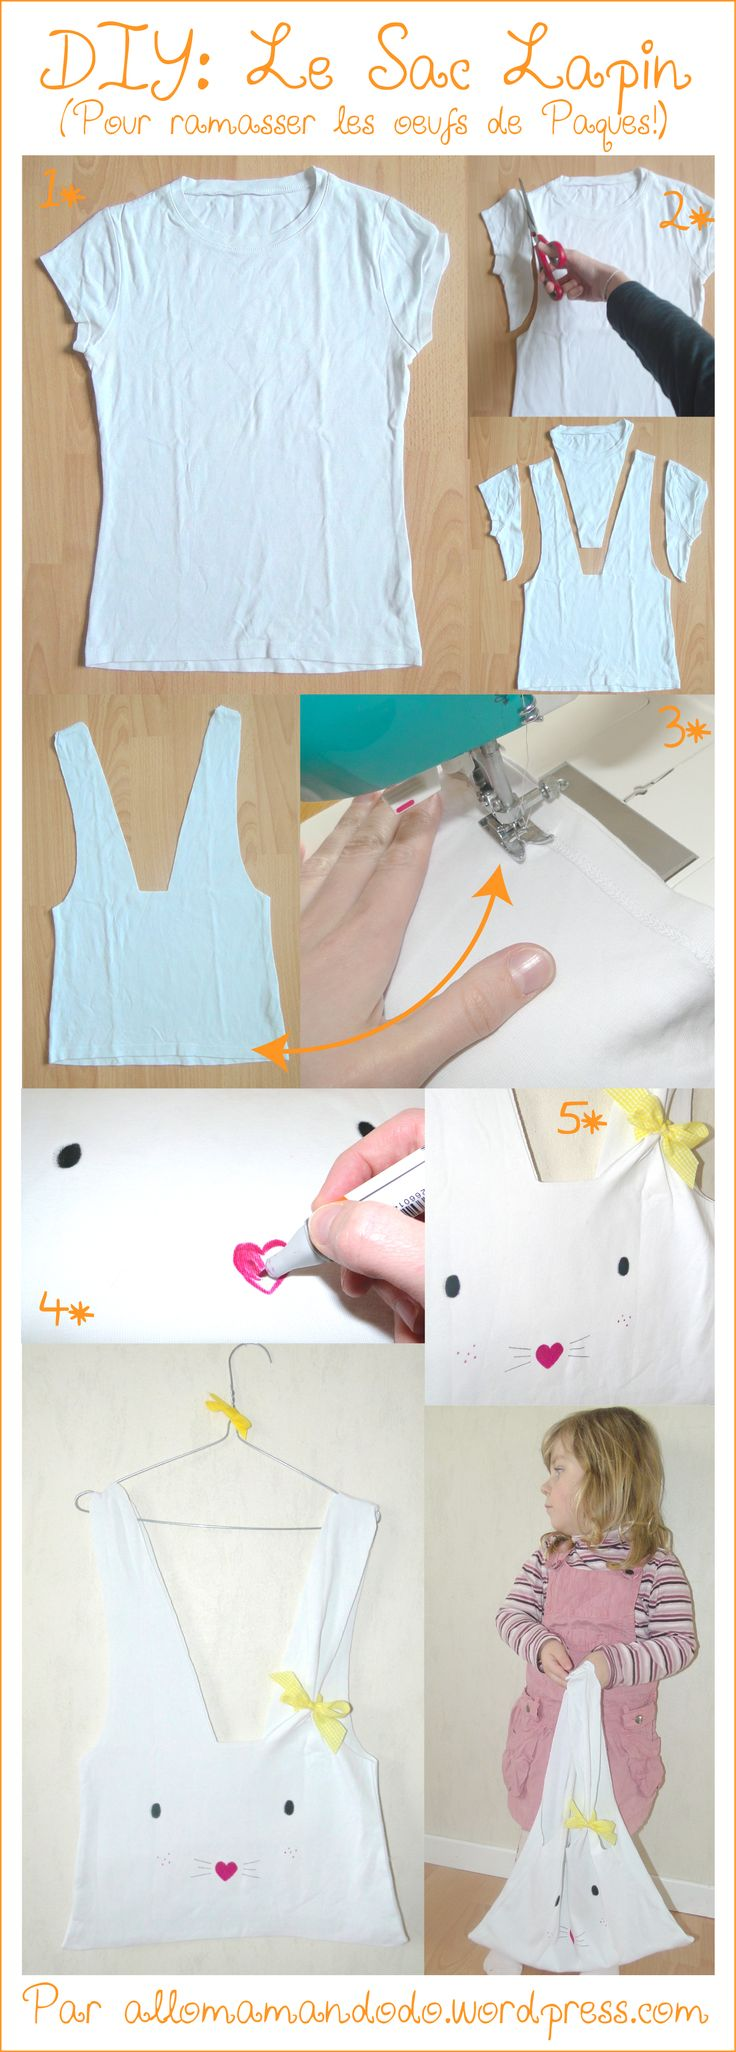 tendance sac femme 2017 2018 diy tuto sac lapin pques enfant activit bricolage facile. Black Bedroom Furniture Sets. Home Design Ideas